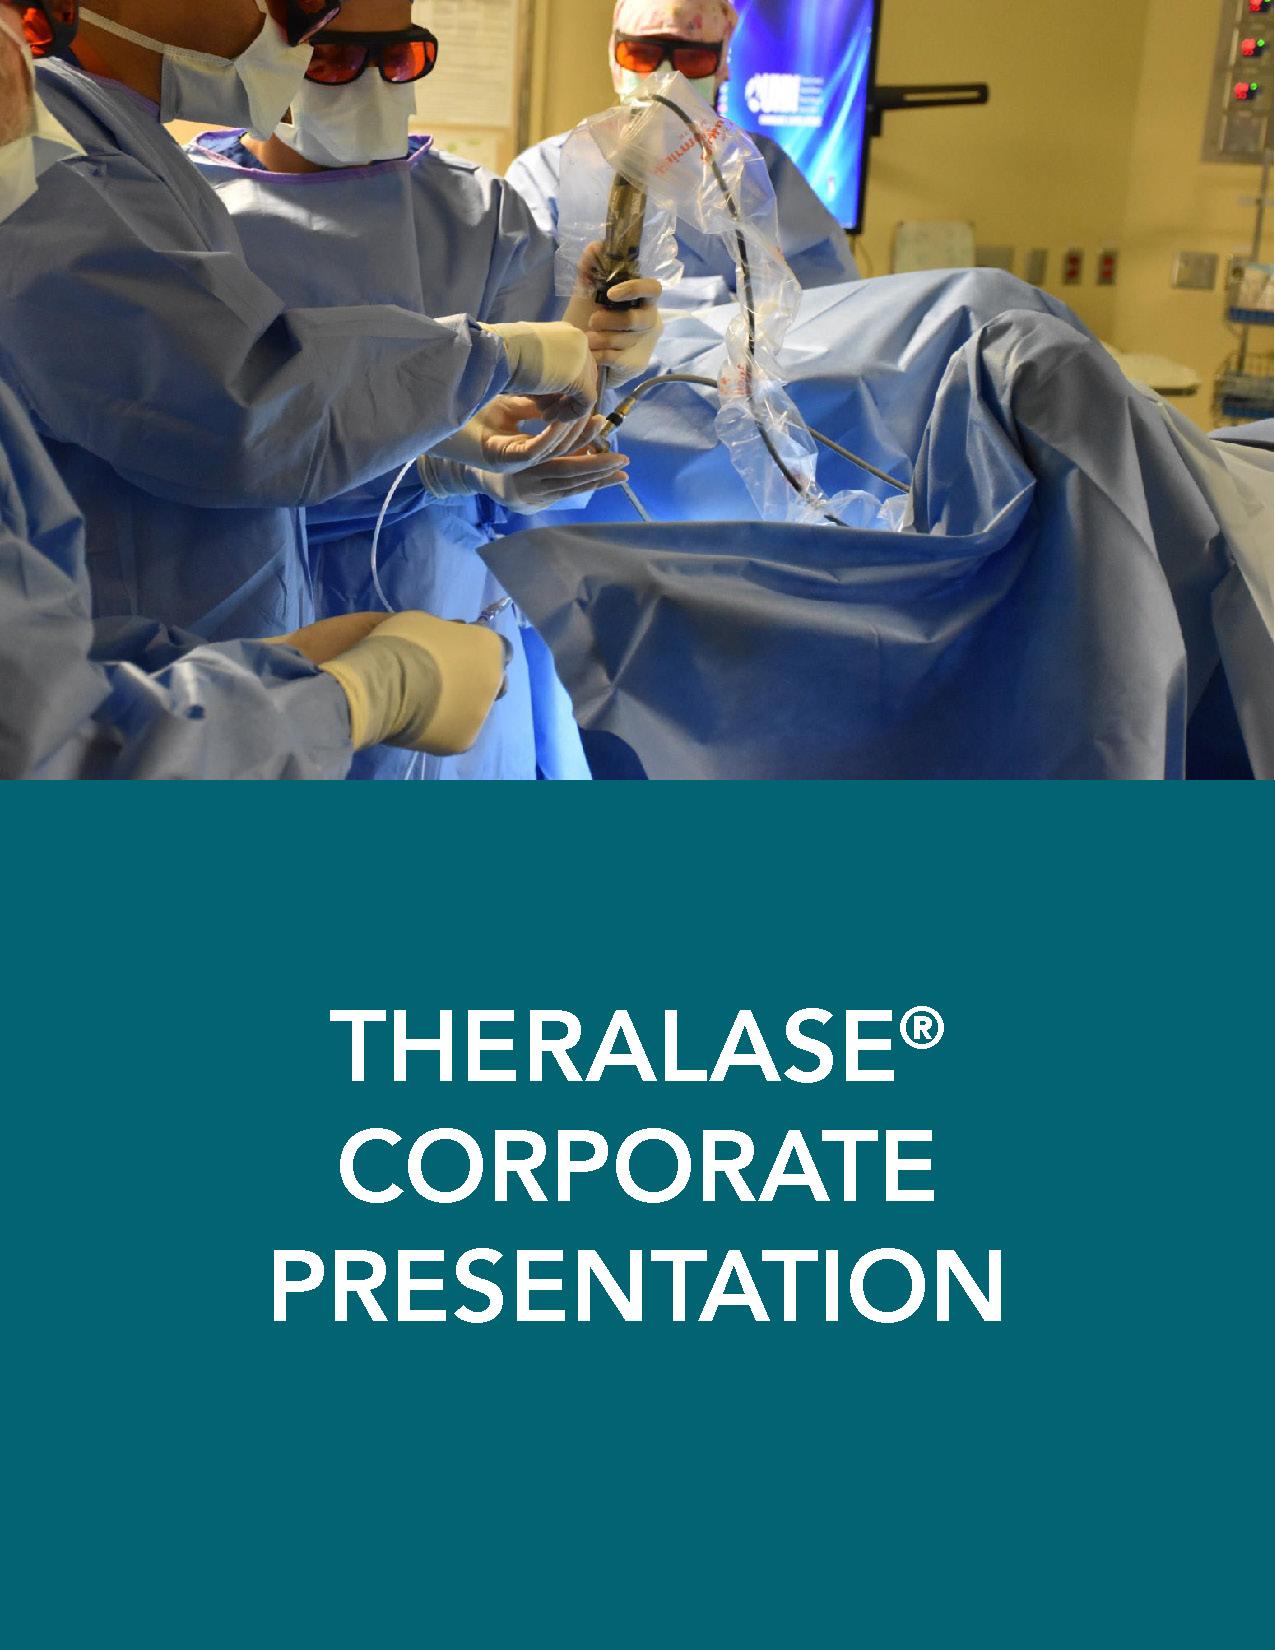 Theralase corporate presentation